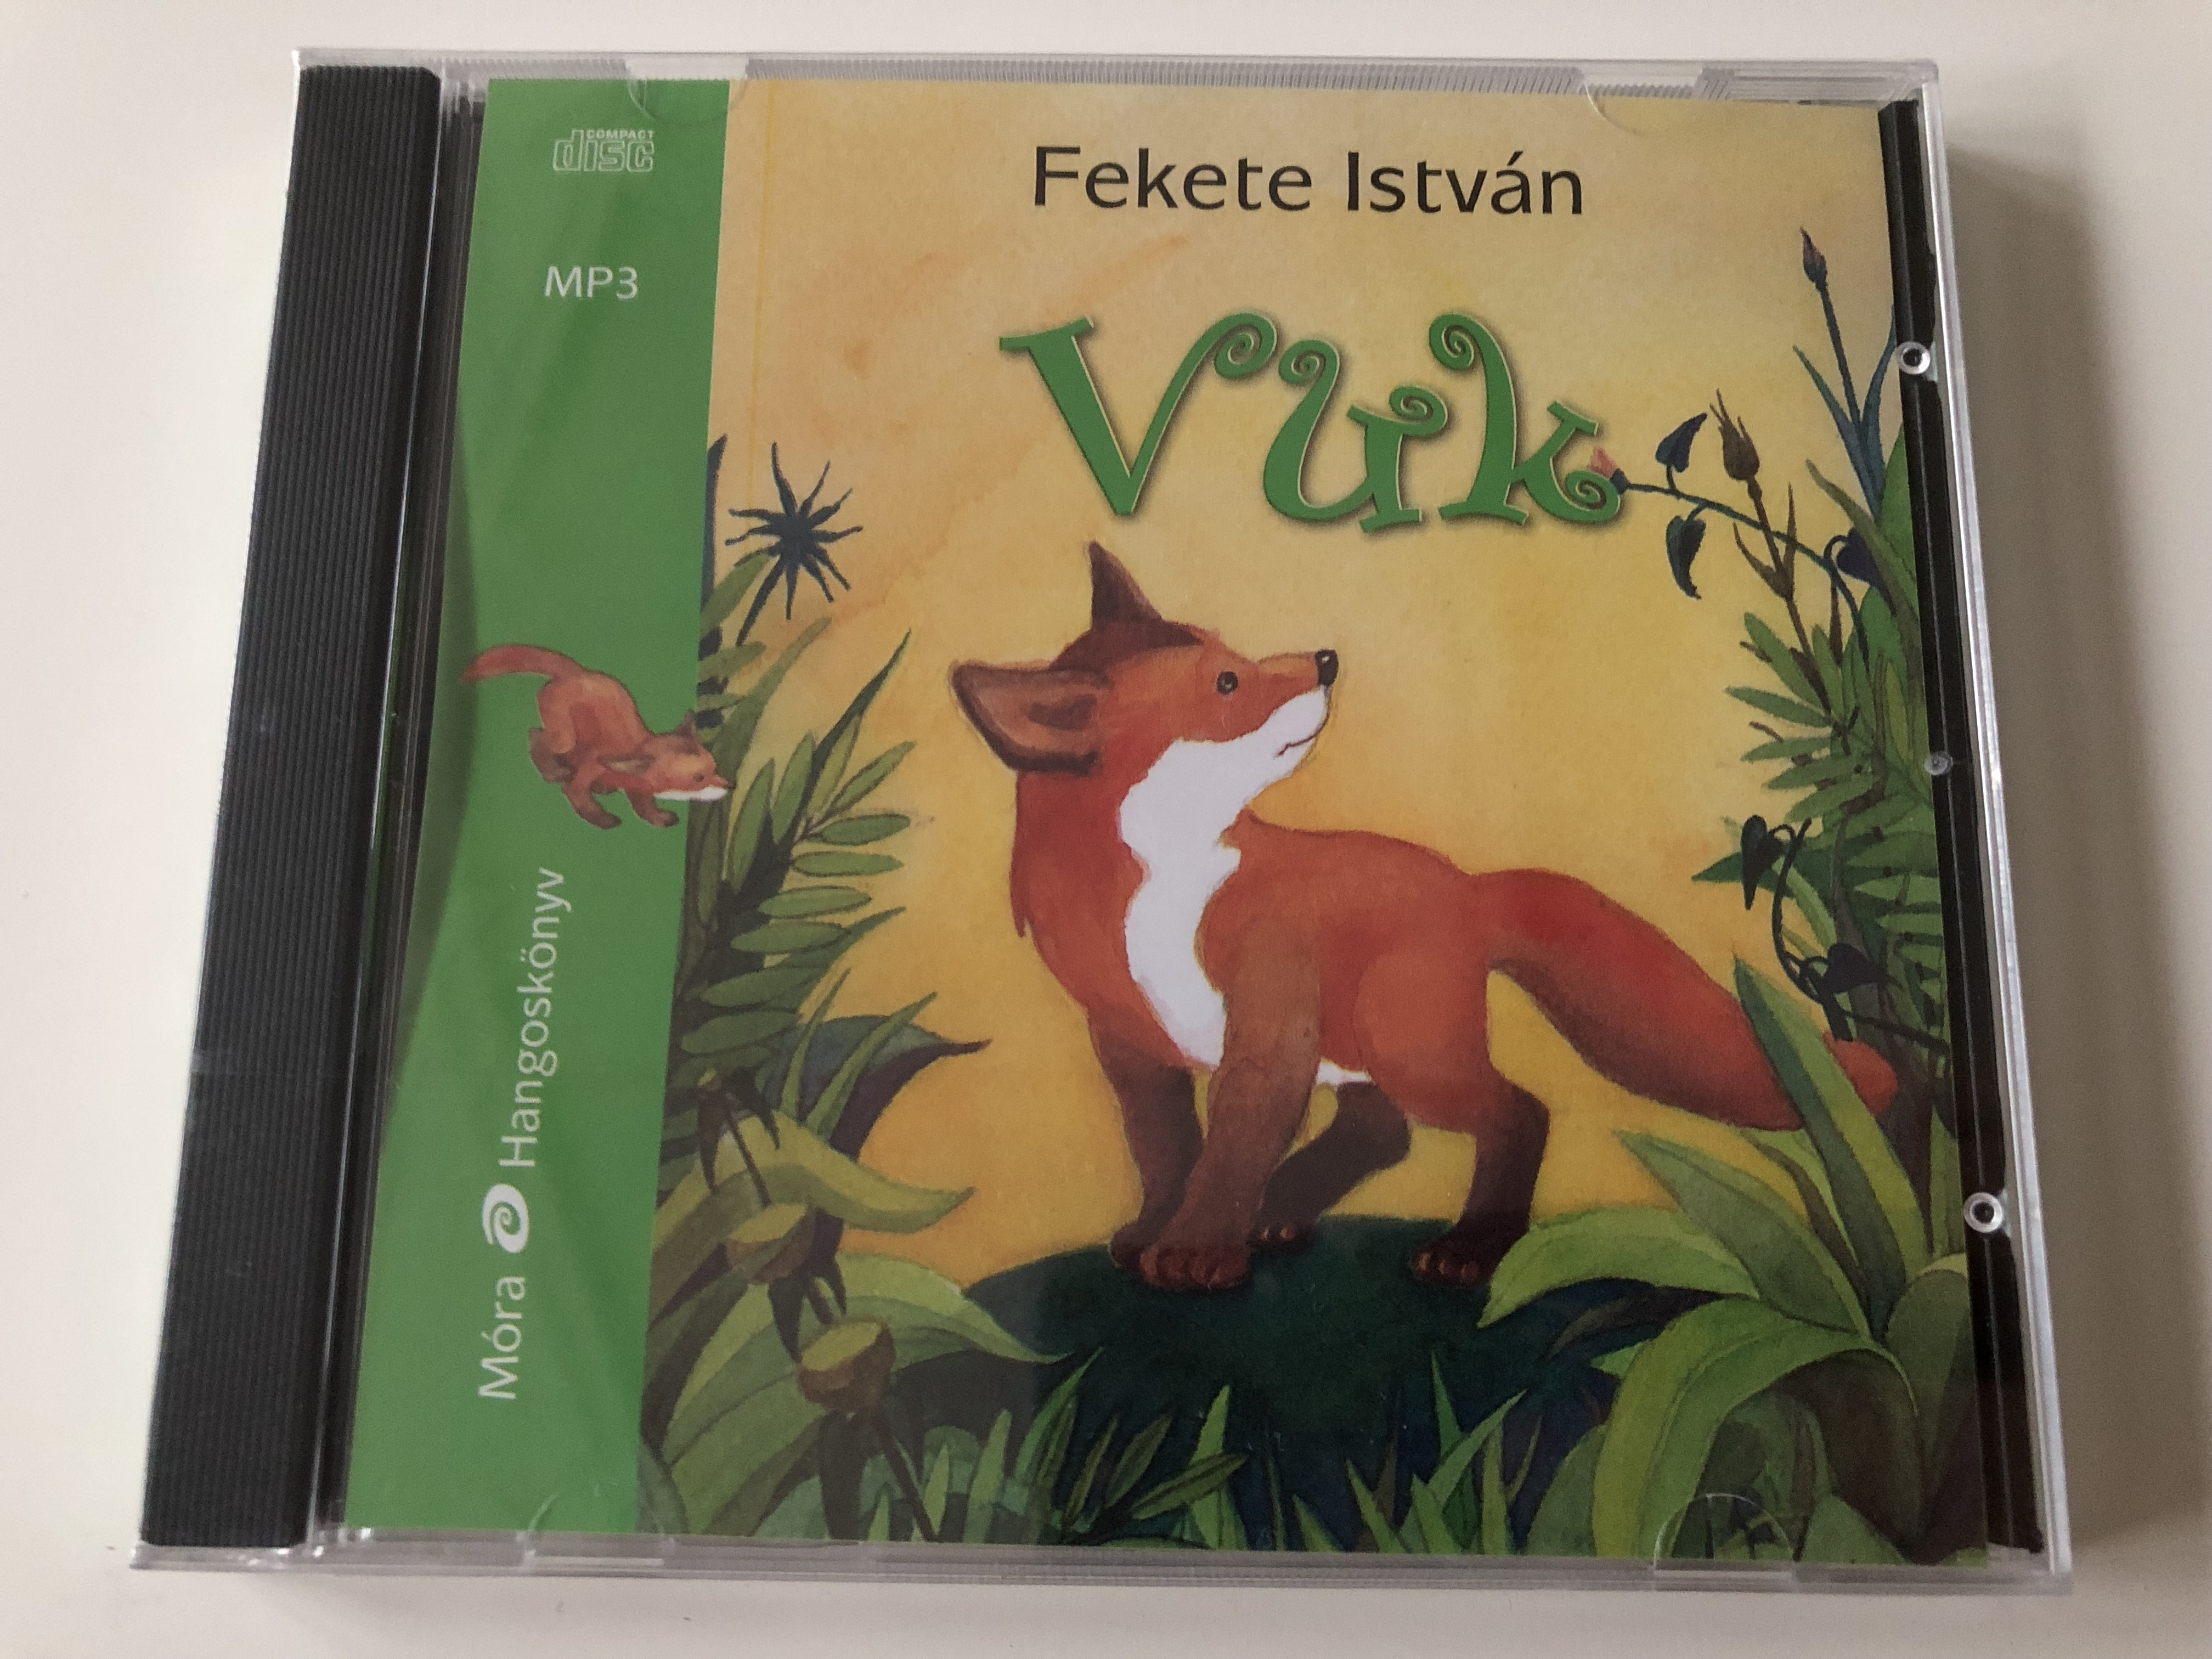 vuk-by-fekete-istv-n-hungarian-language-mp3-audio-book-vuk-the-fox-cub-read-by-gyabronka-j-zsef-m-ra-k-nyvkiad-2016-1-.jpg